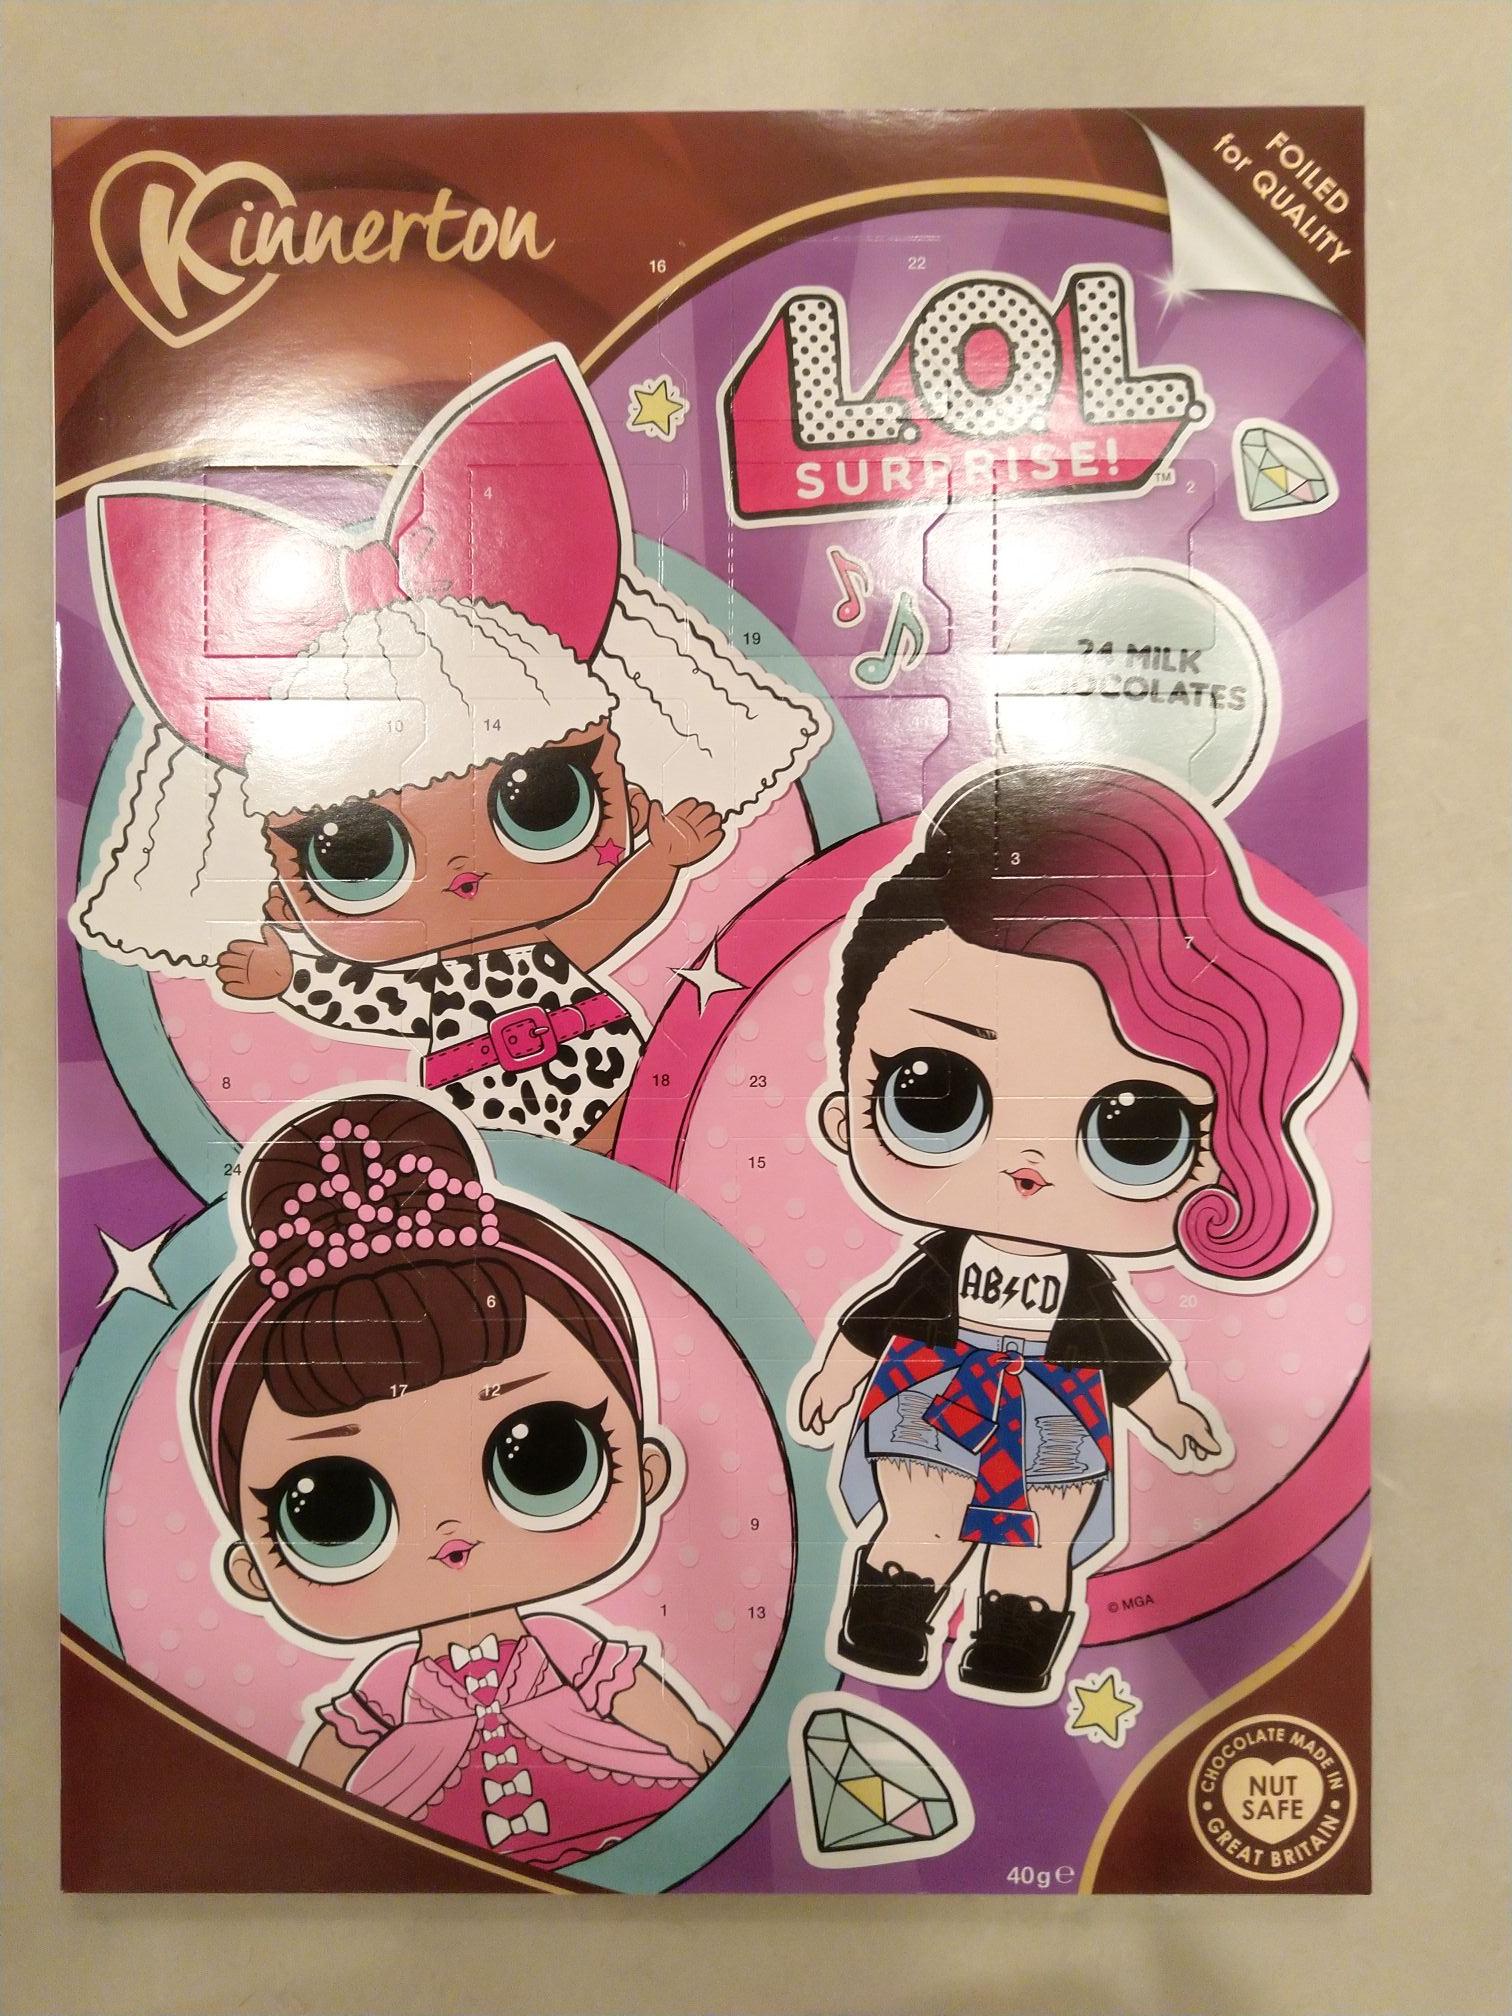 Chocolate advent calendars £1 in B&M, LOL, Simpsons, Transformers, My little pony...